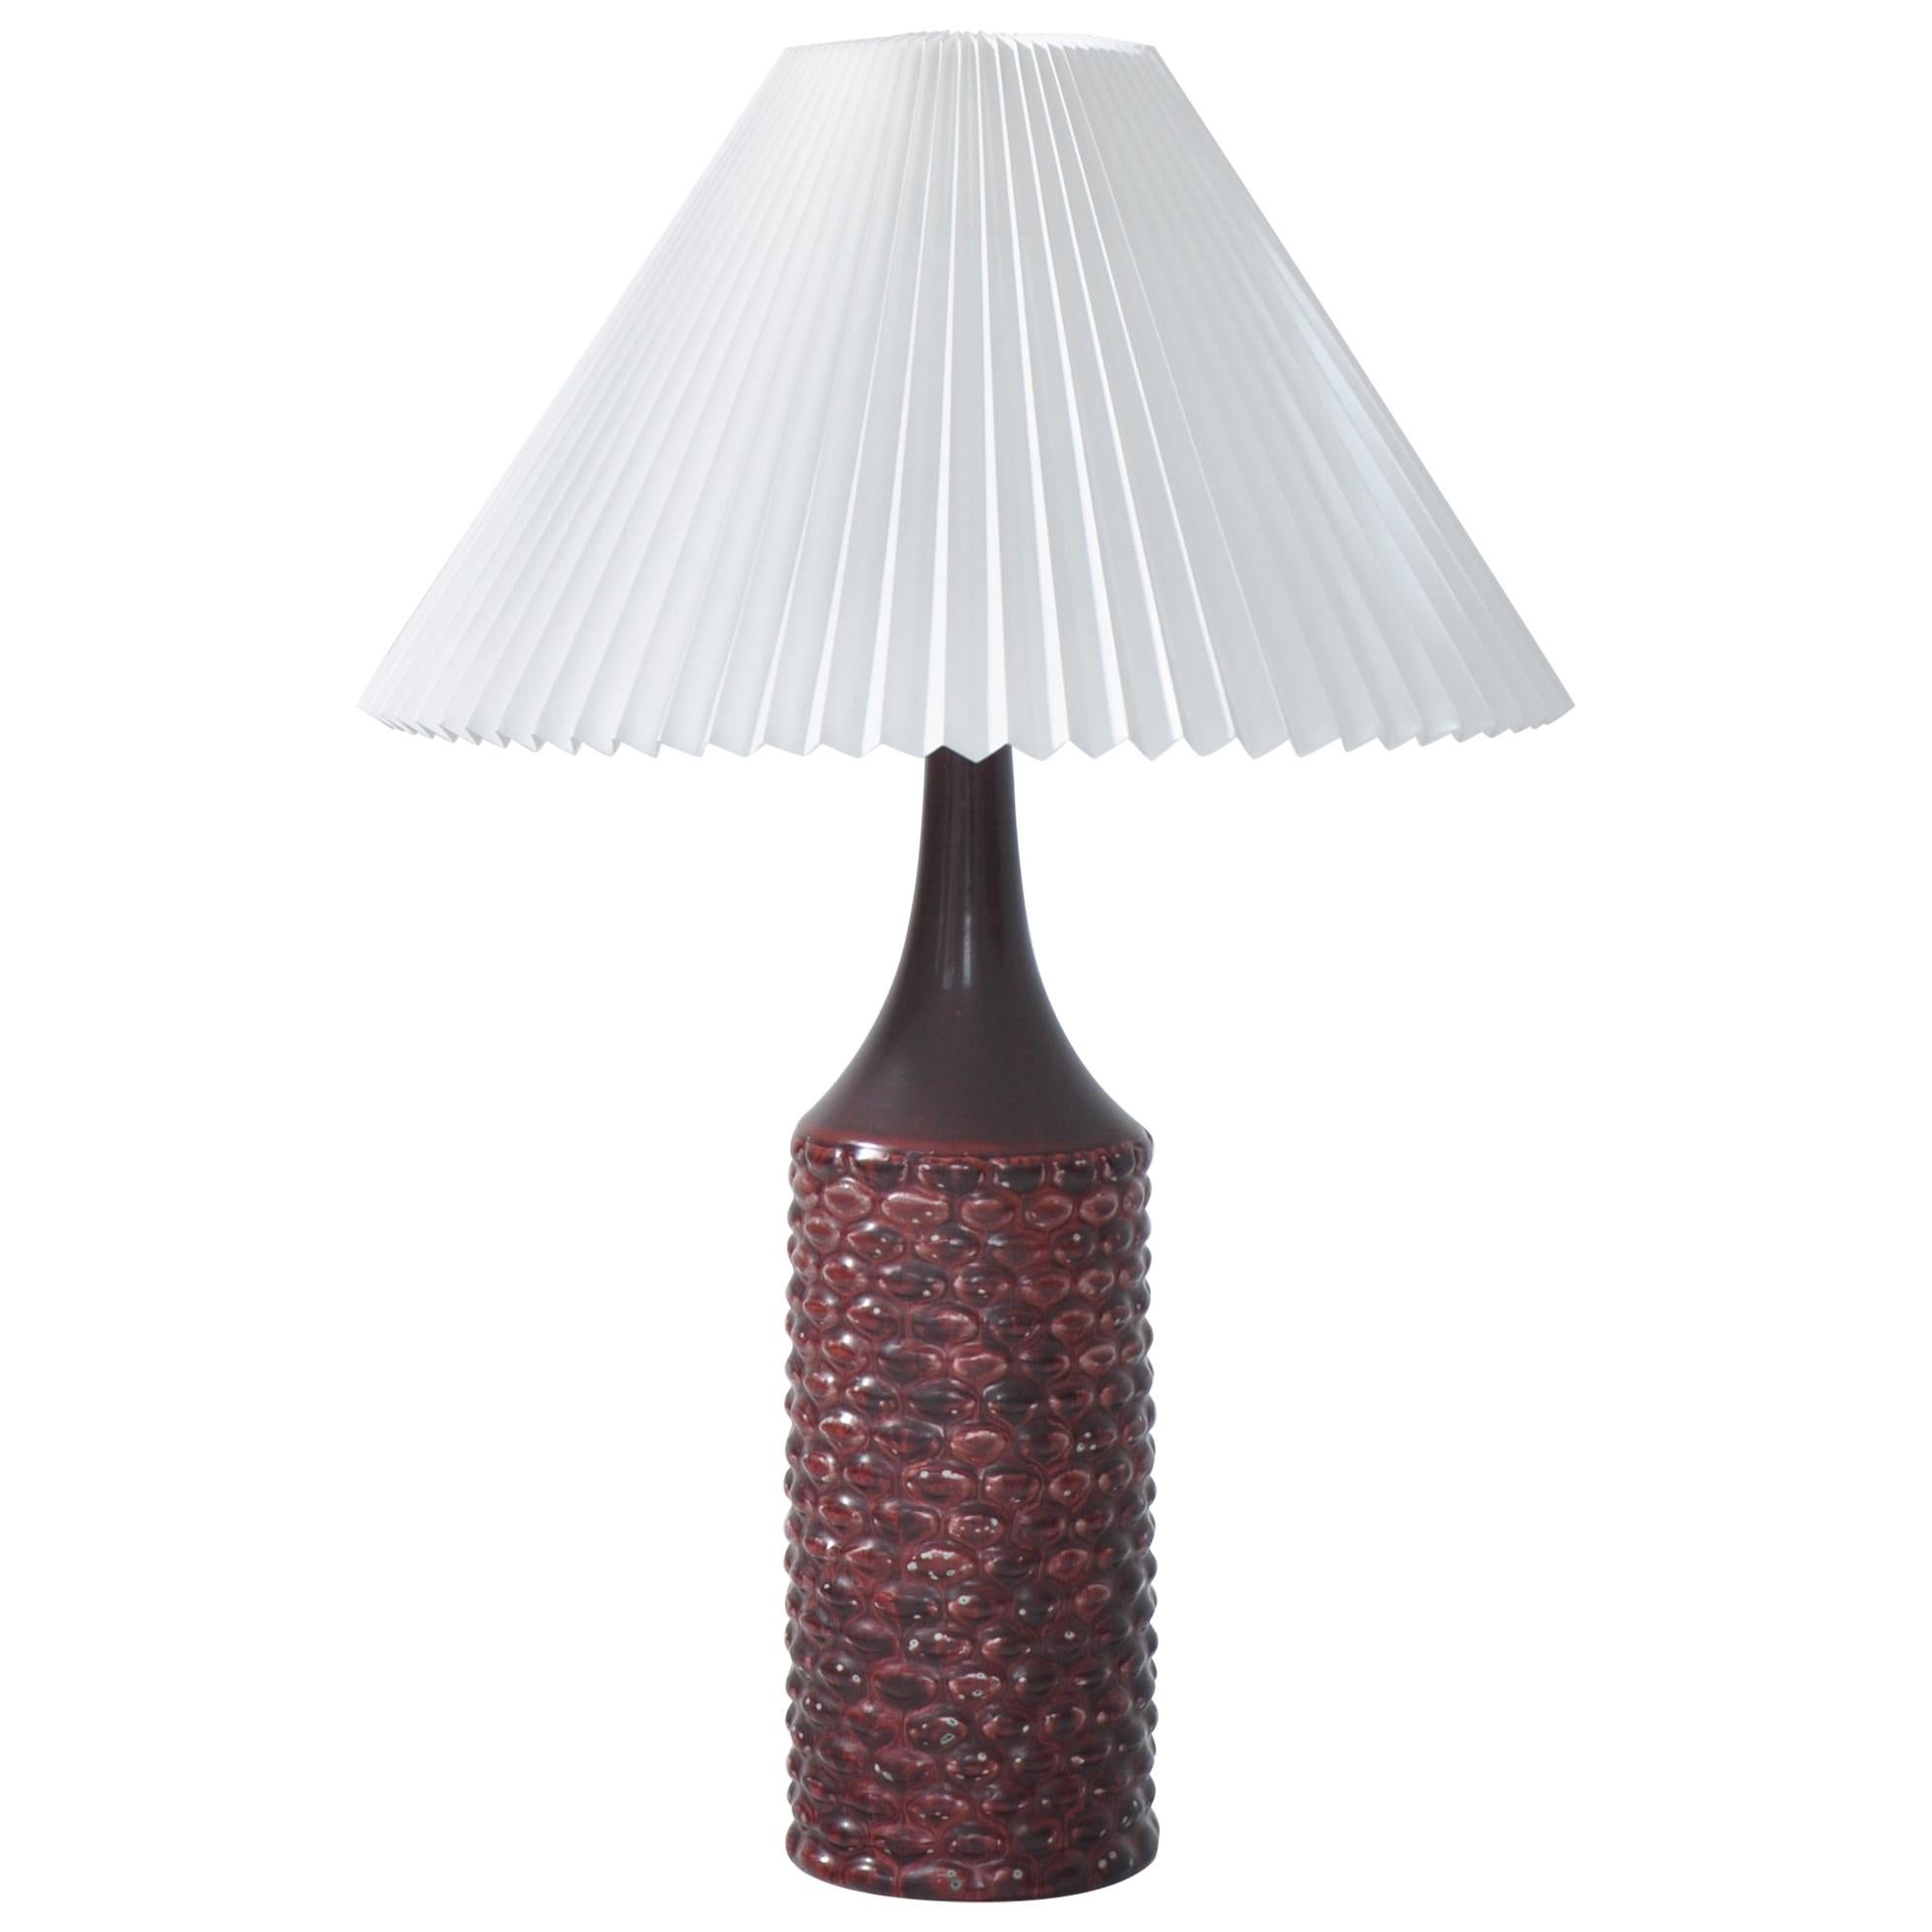 Axel Salto Large Table Lamp in Oxblood Glaze from Royal Copenhagen, 1958